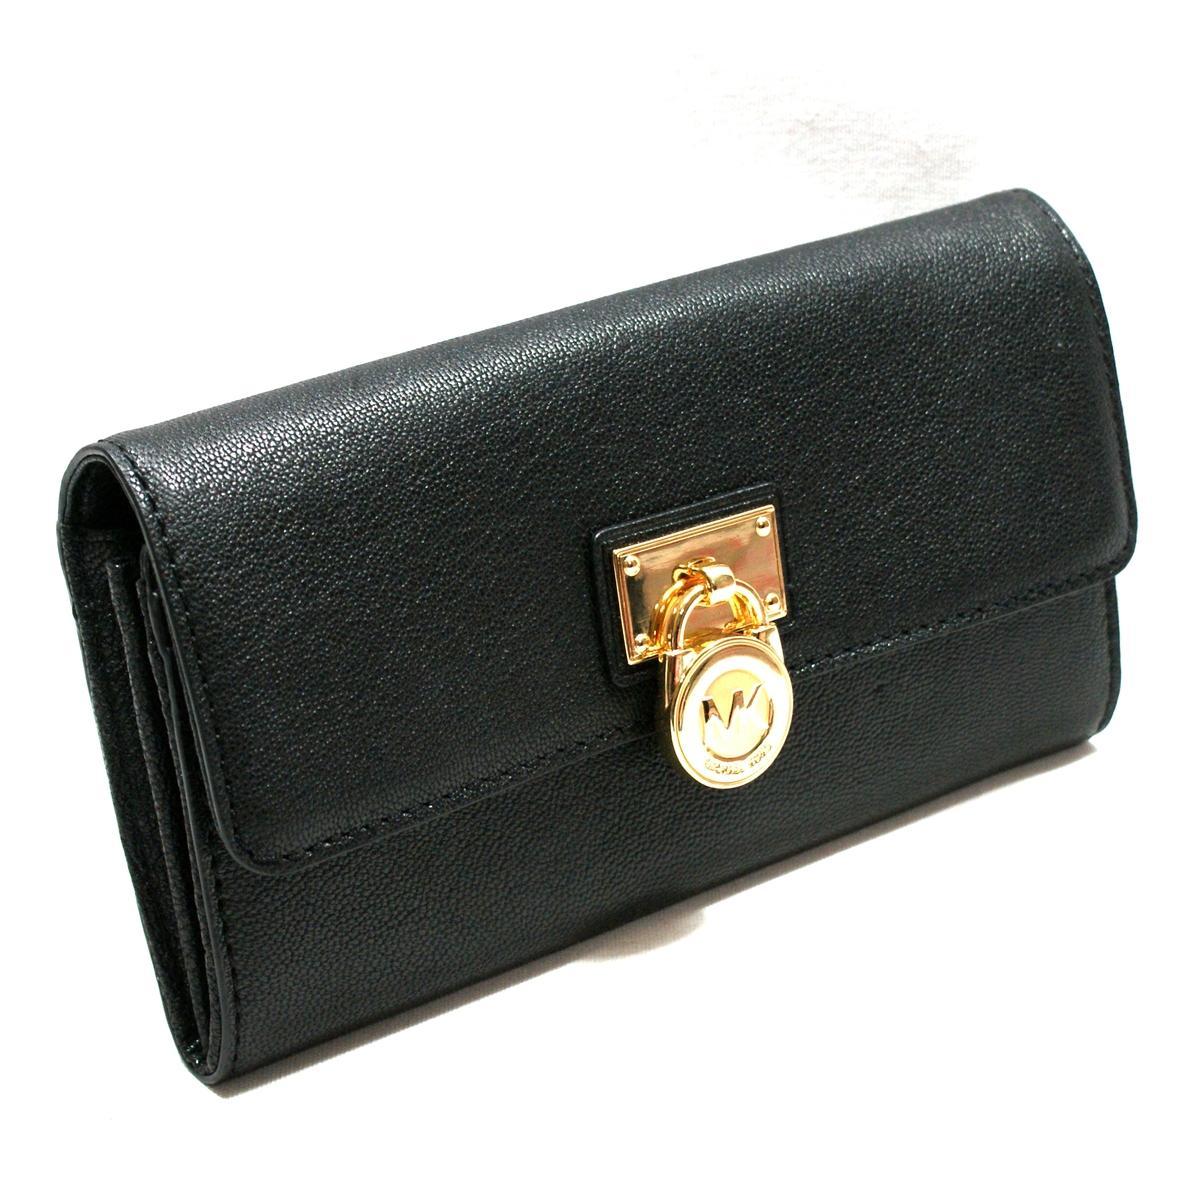 Michael Kors Hamilton Genuine Leather Large Flap Wallet